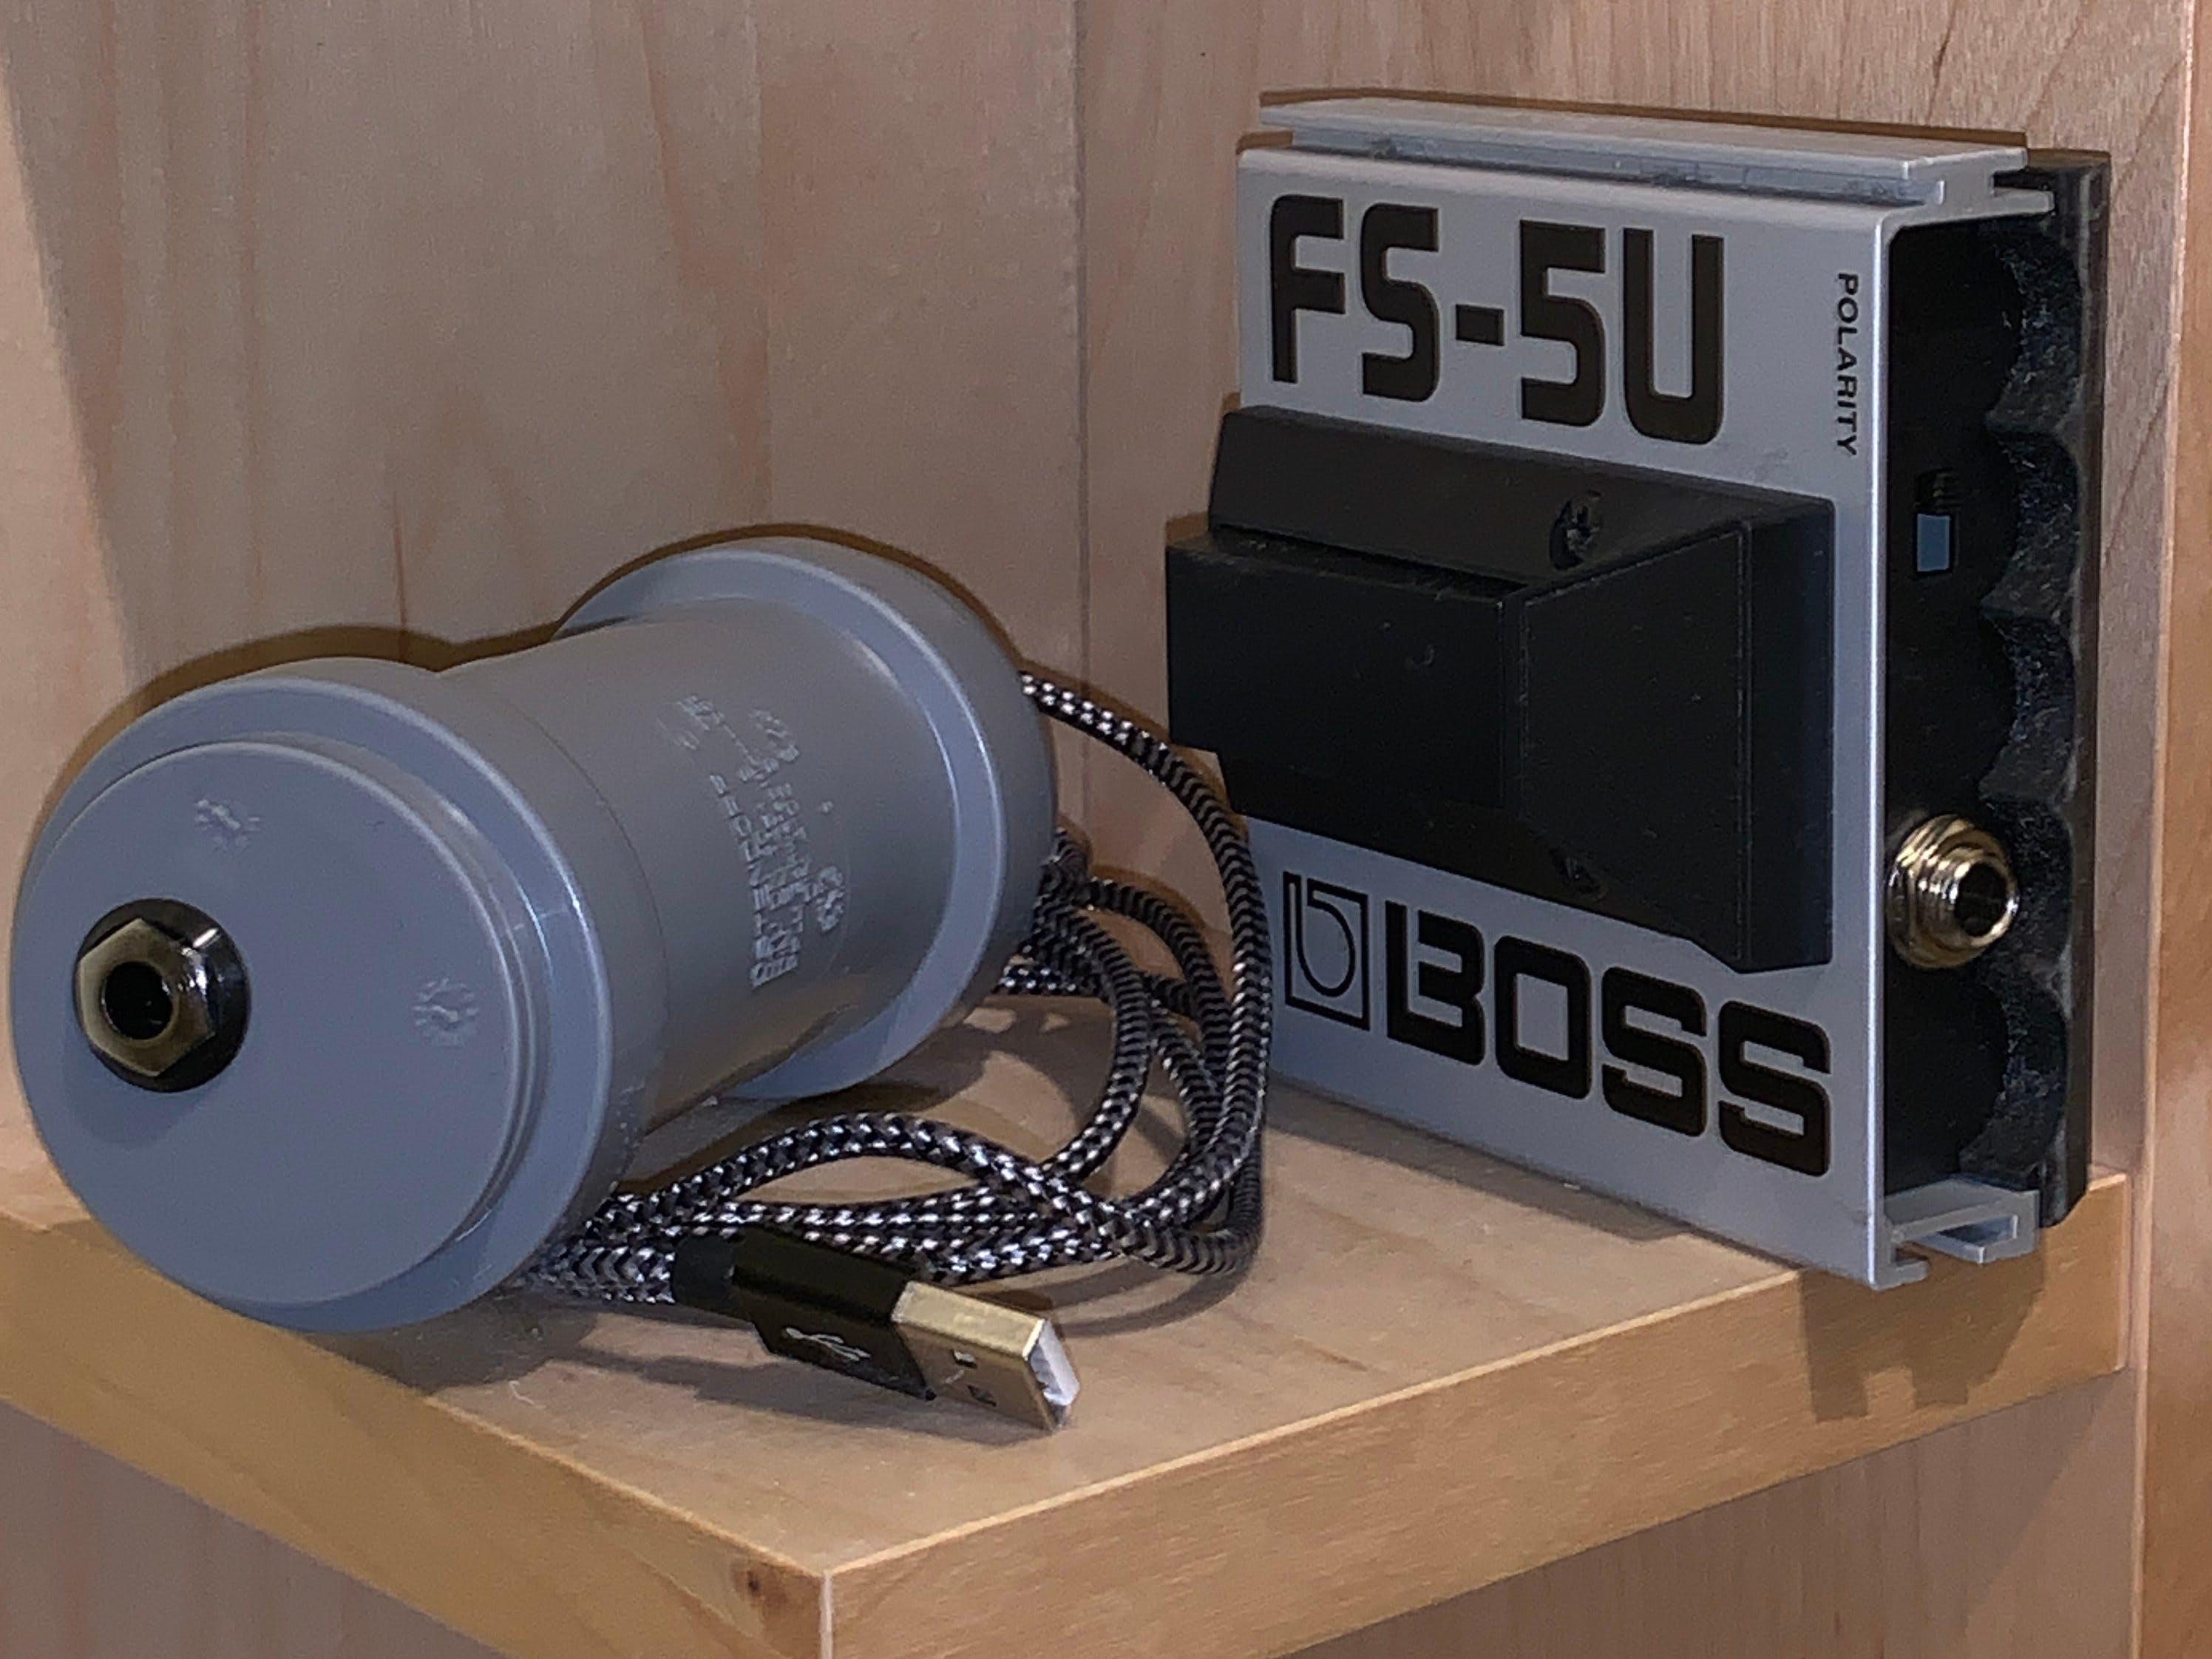 USB Footswitch from Boss FS-5U, 6U and Similar